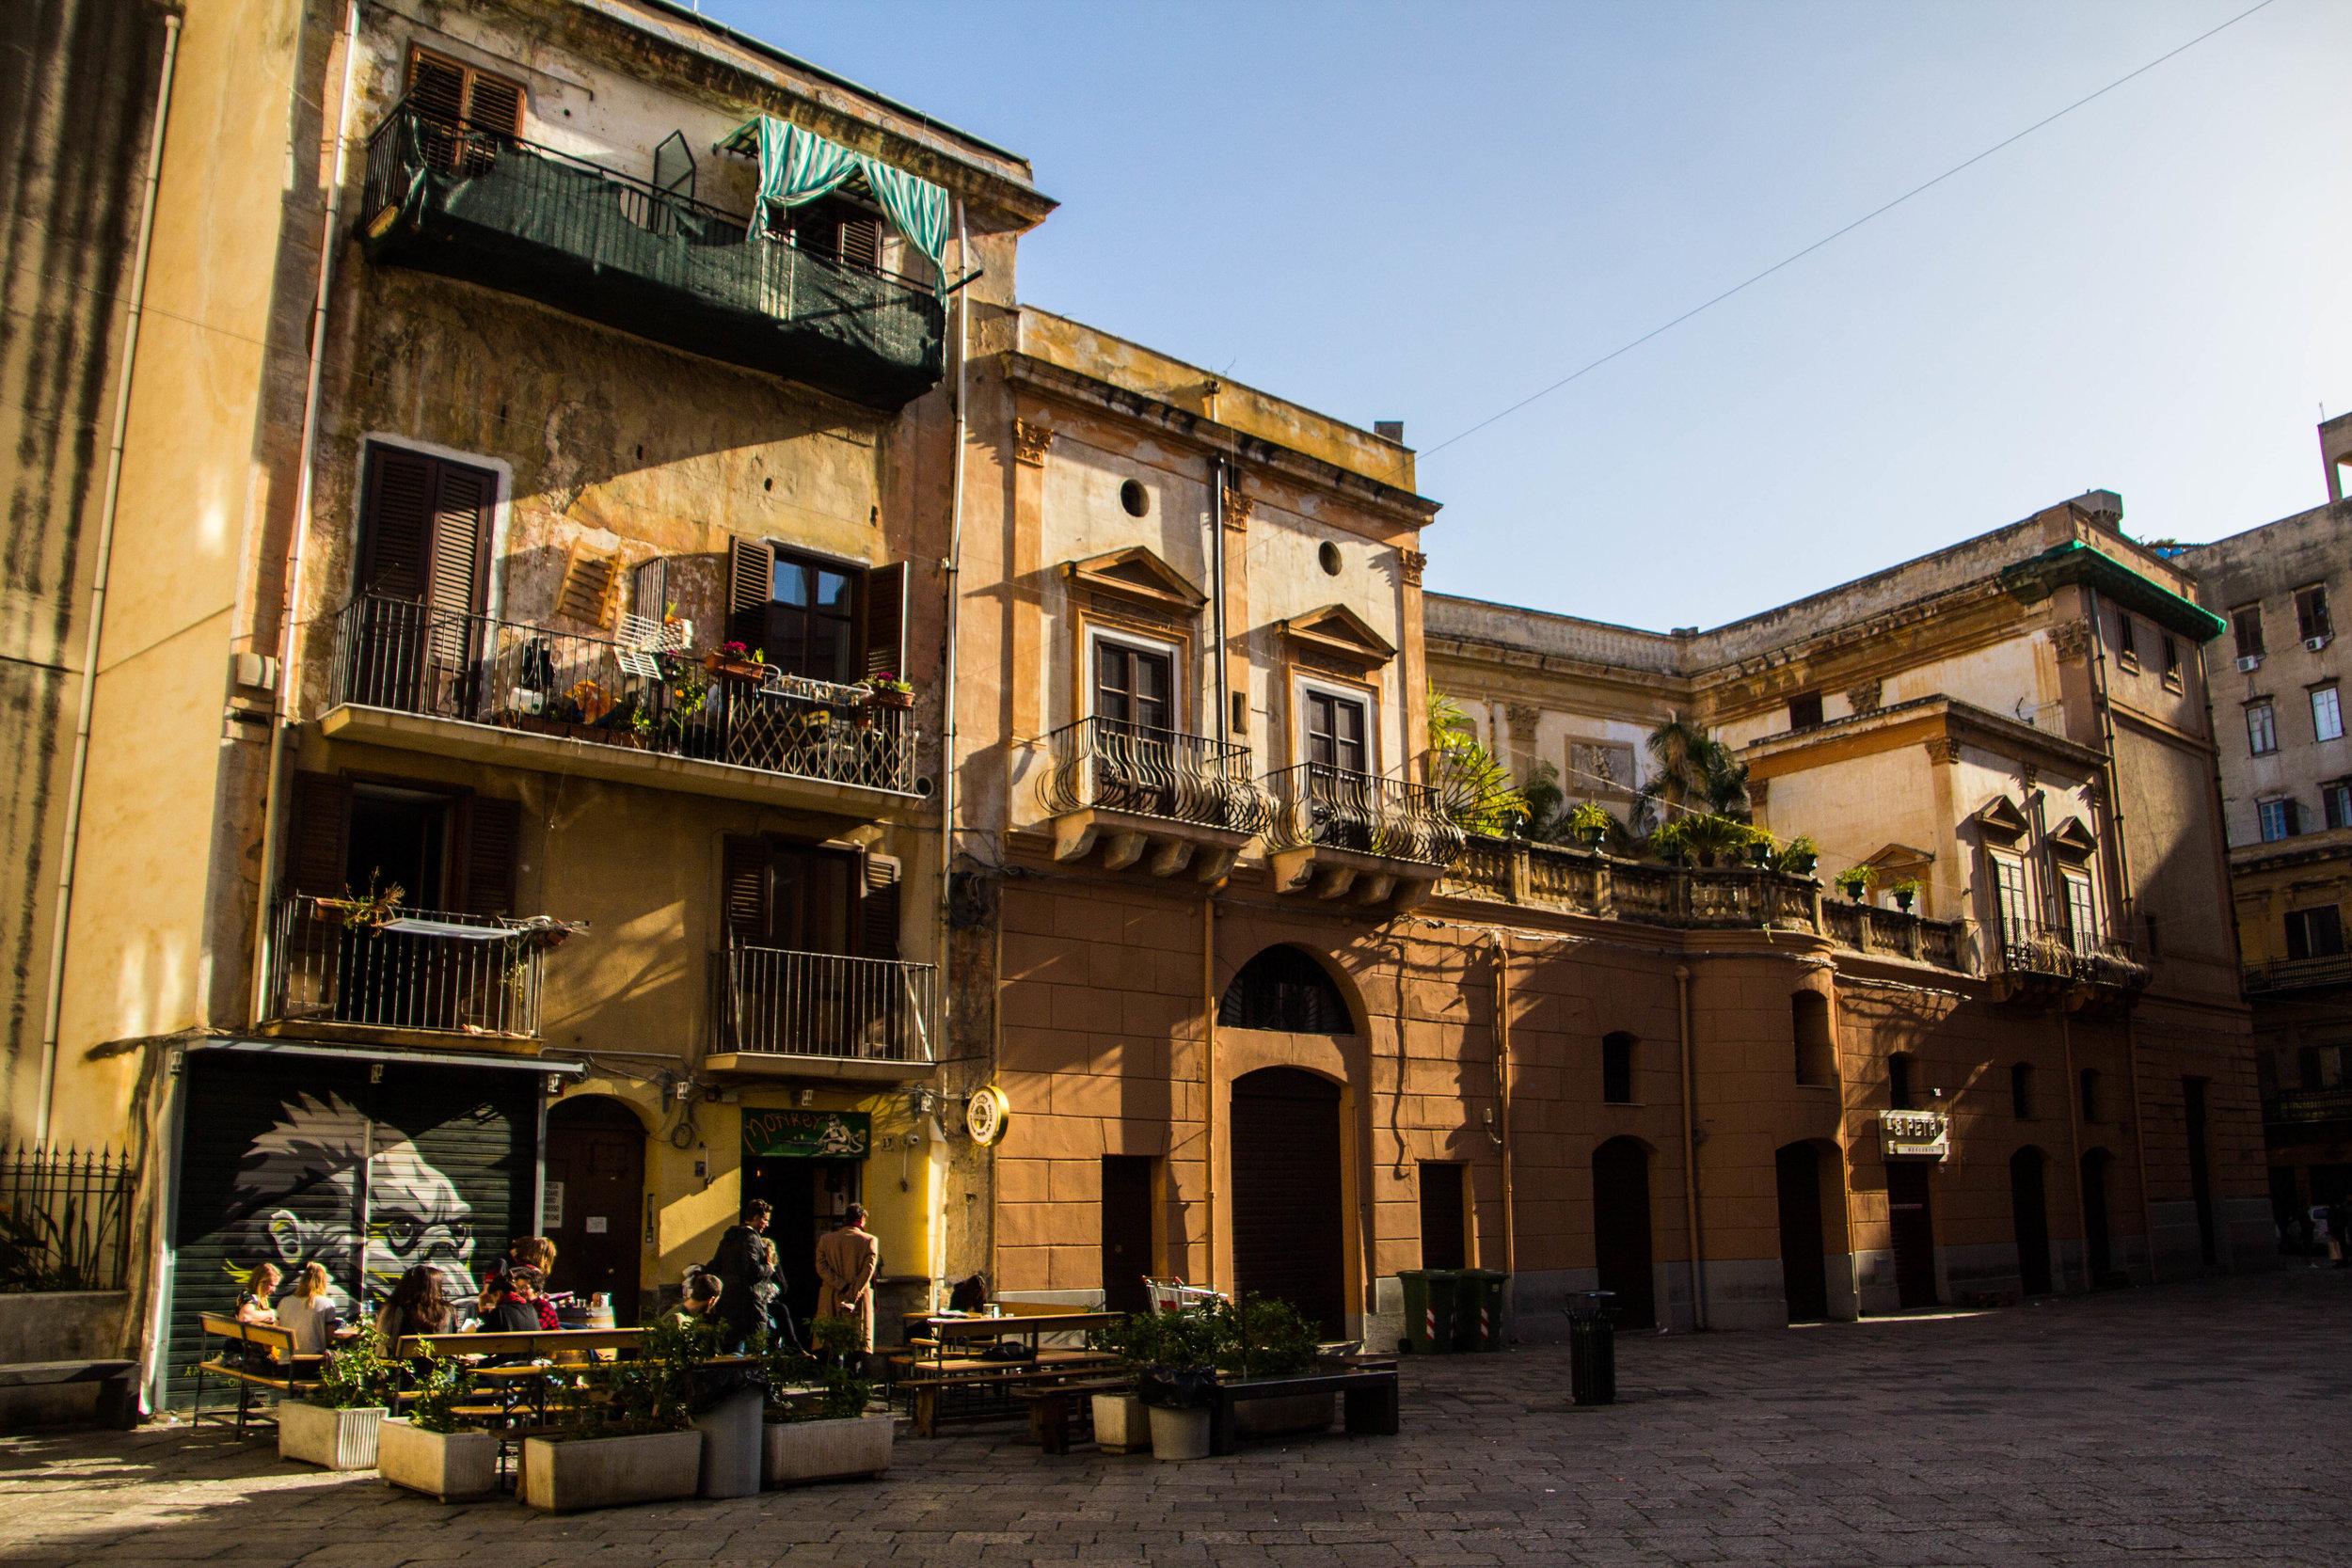 streets-palermo-sicily-6.jpg